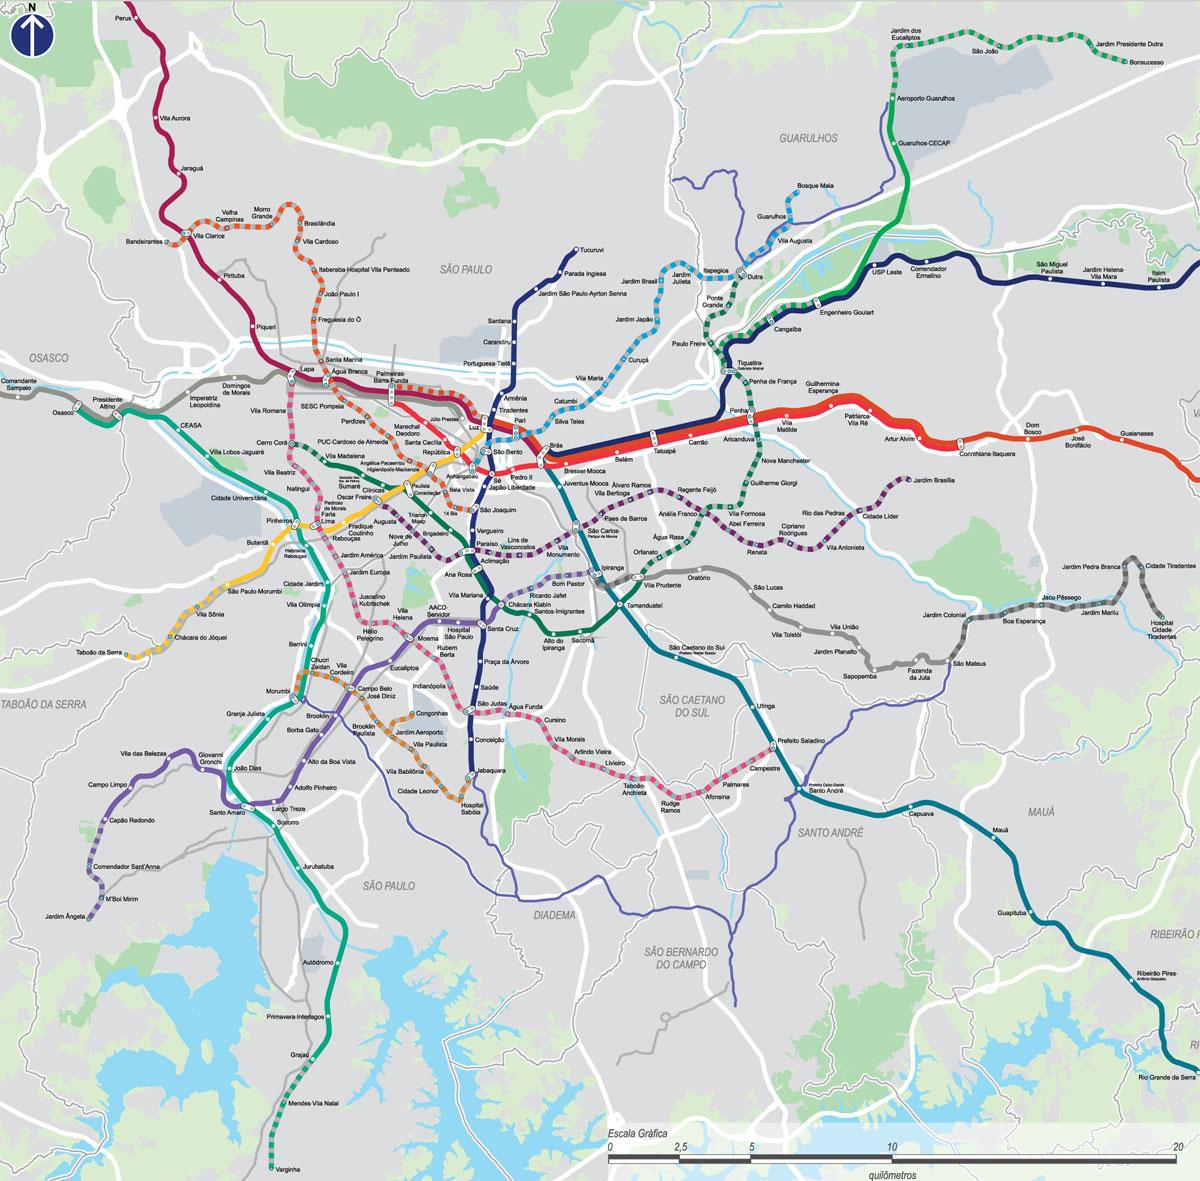 mapa-relatorio-metro-rede-futura